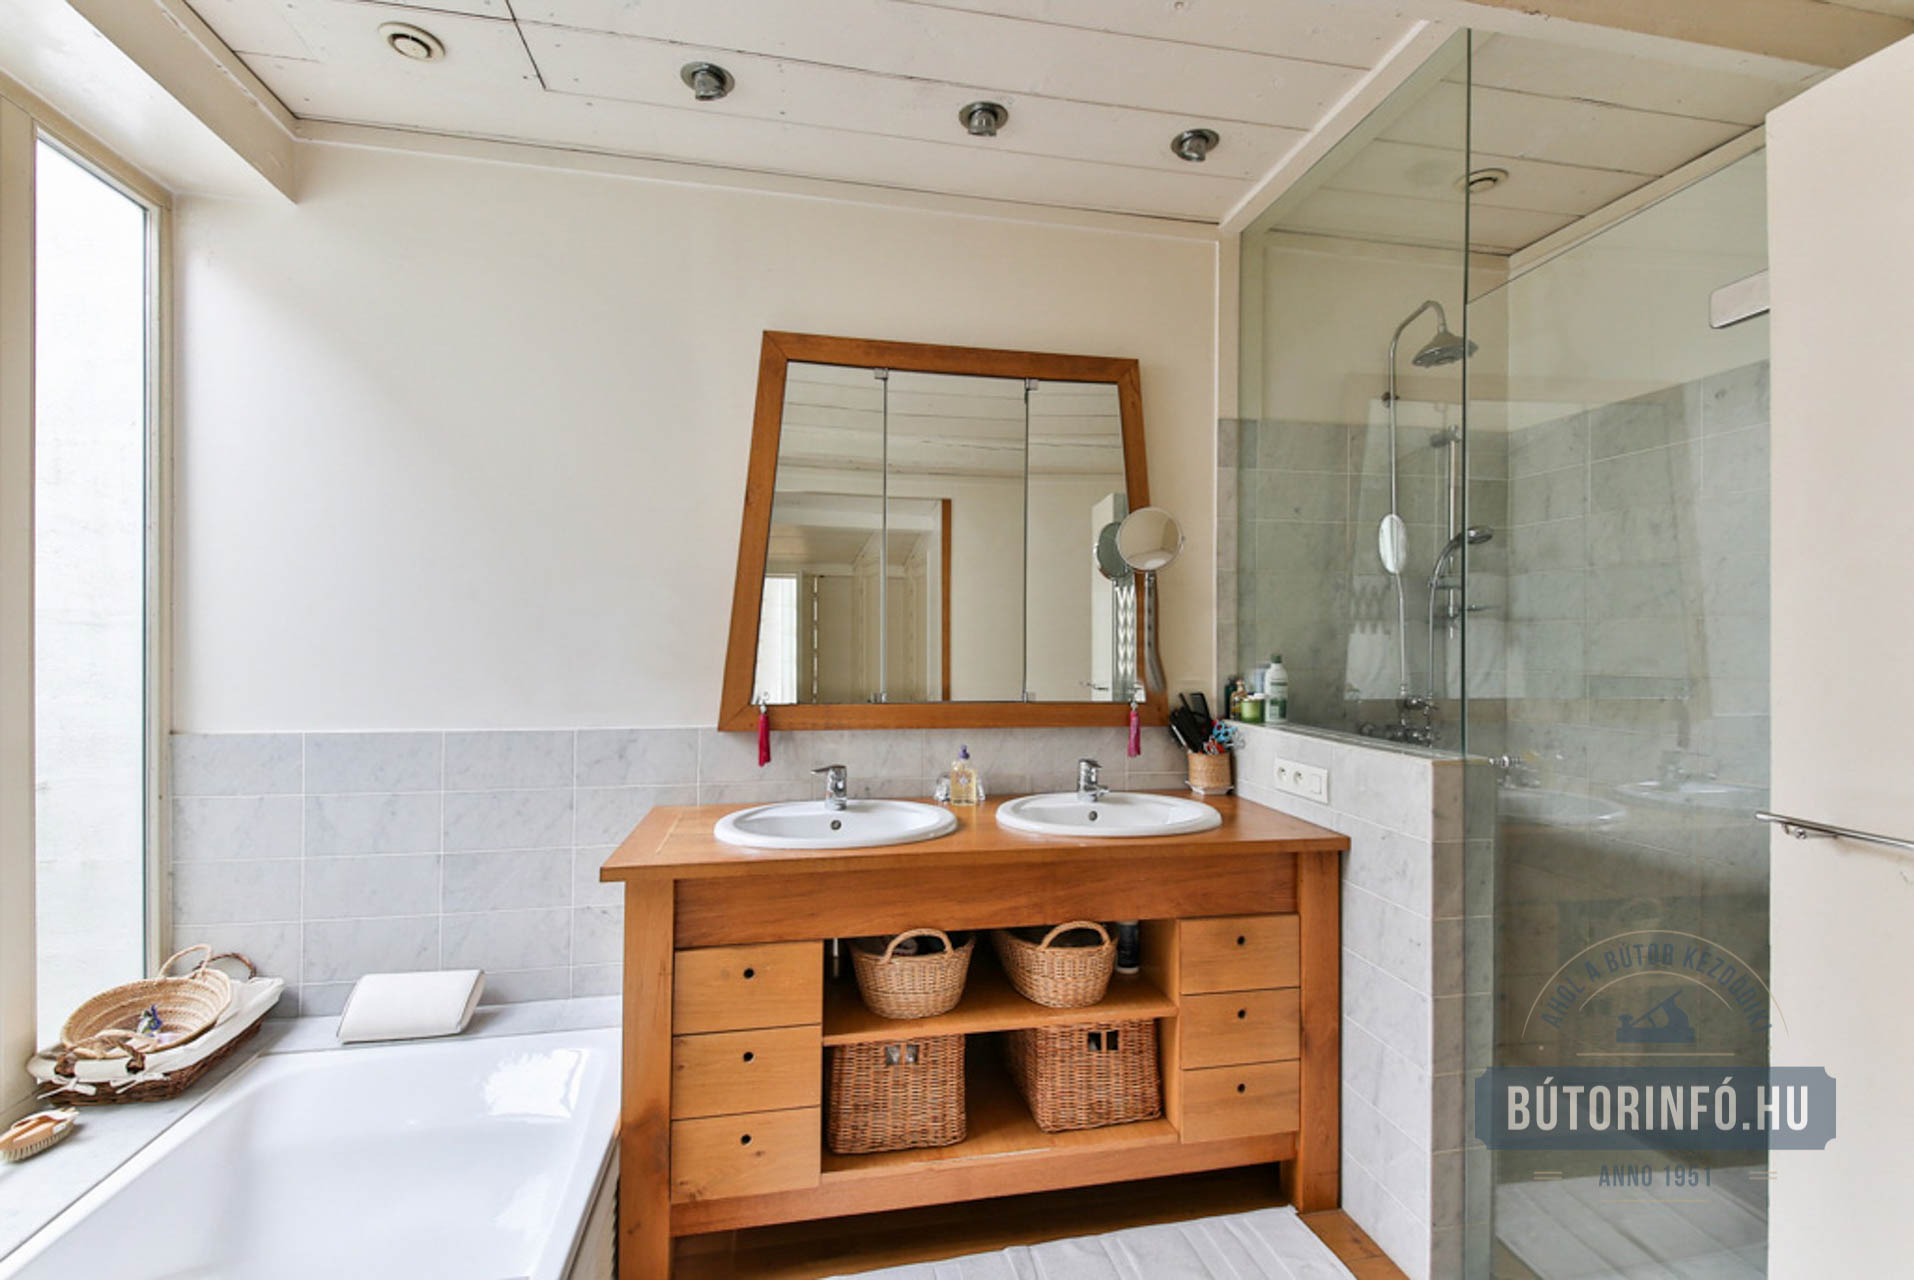 Tömörfa fürdőszoba bútor 2016 1